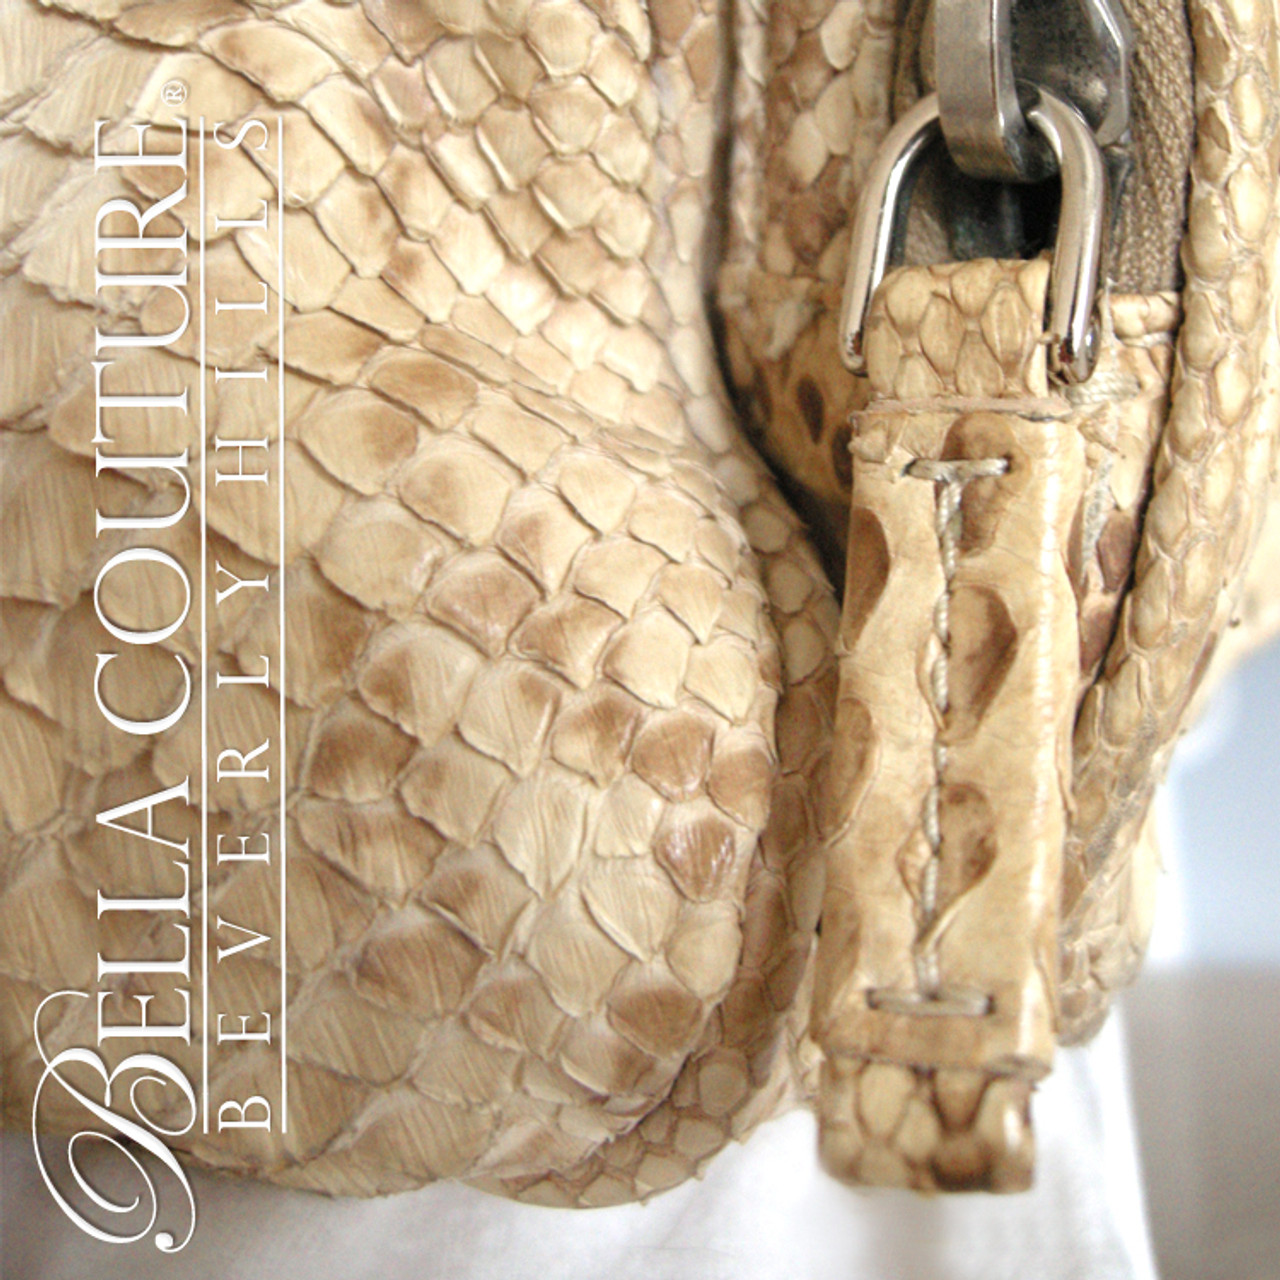 c8bd0ea79d13 ... norway new rare authentic prada beige python snakeskin washed leather  bag tote handbag purse 86c06 1024b